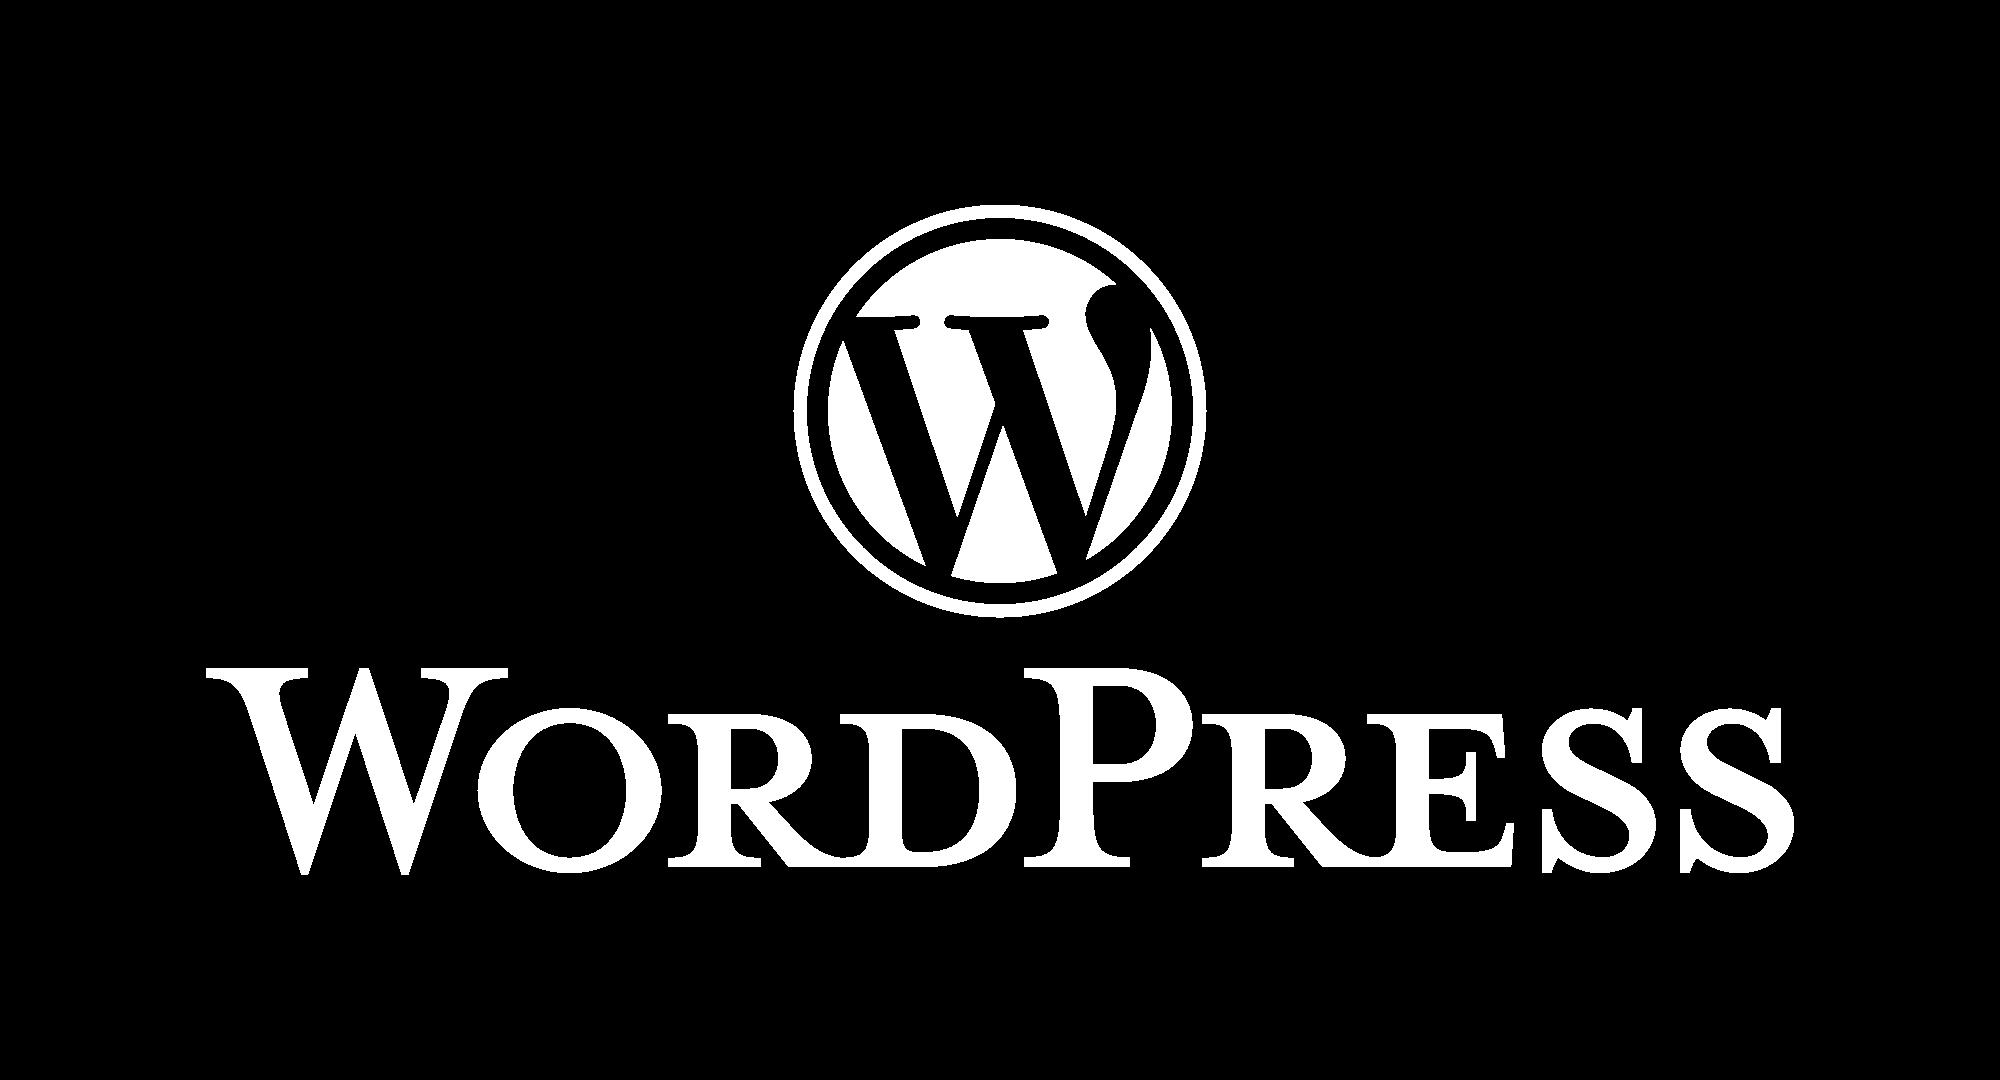 WordPress logotype alternative white - Desarrollo Web - 4